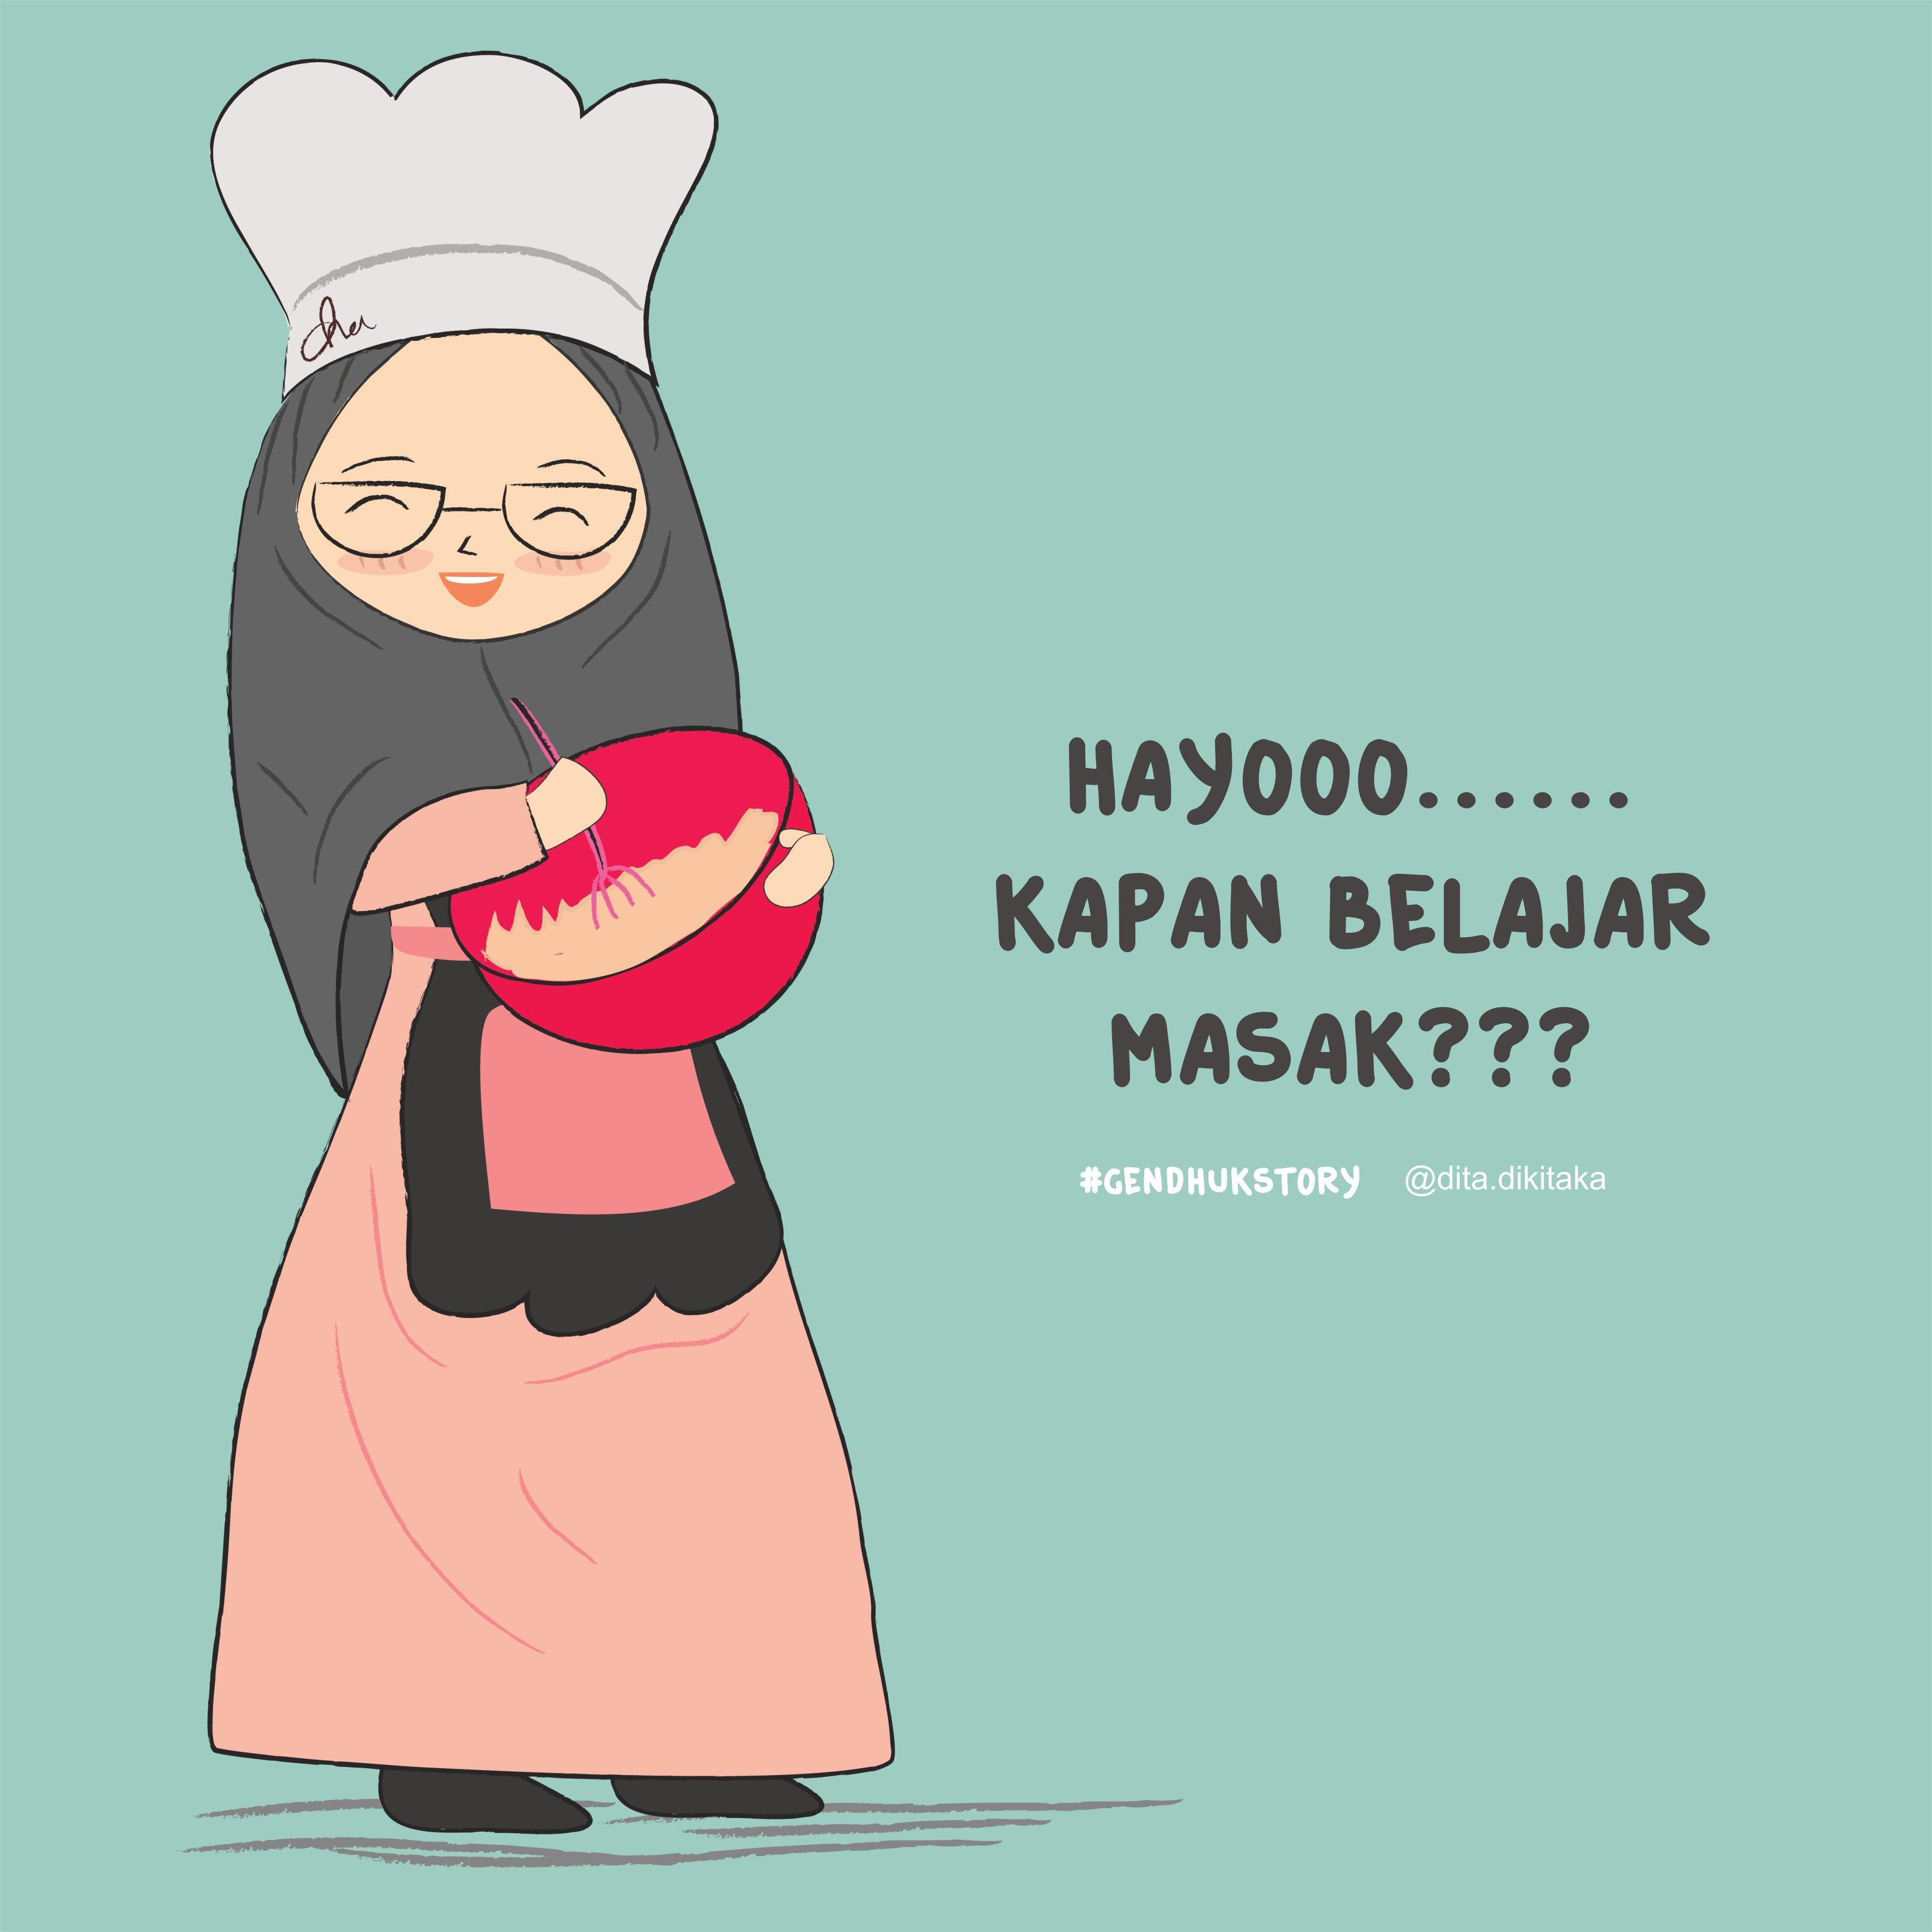 Galeri Gambar Kartun Muslimah Menunggu Jodoh Seribu Animasi